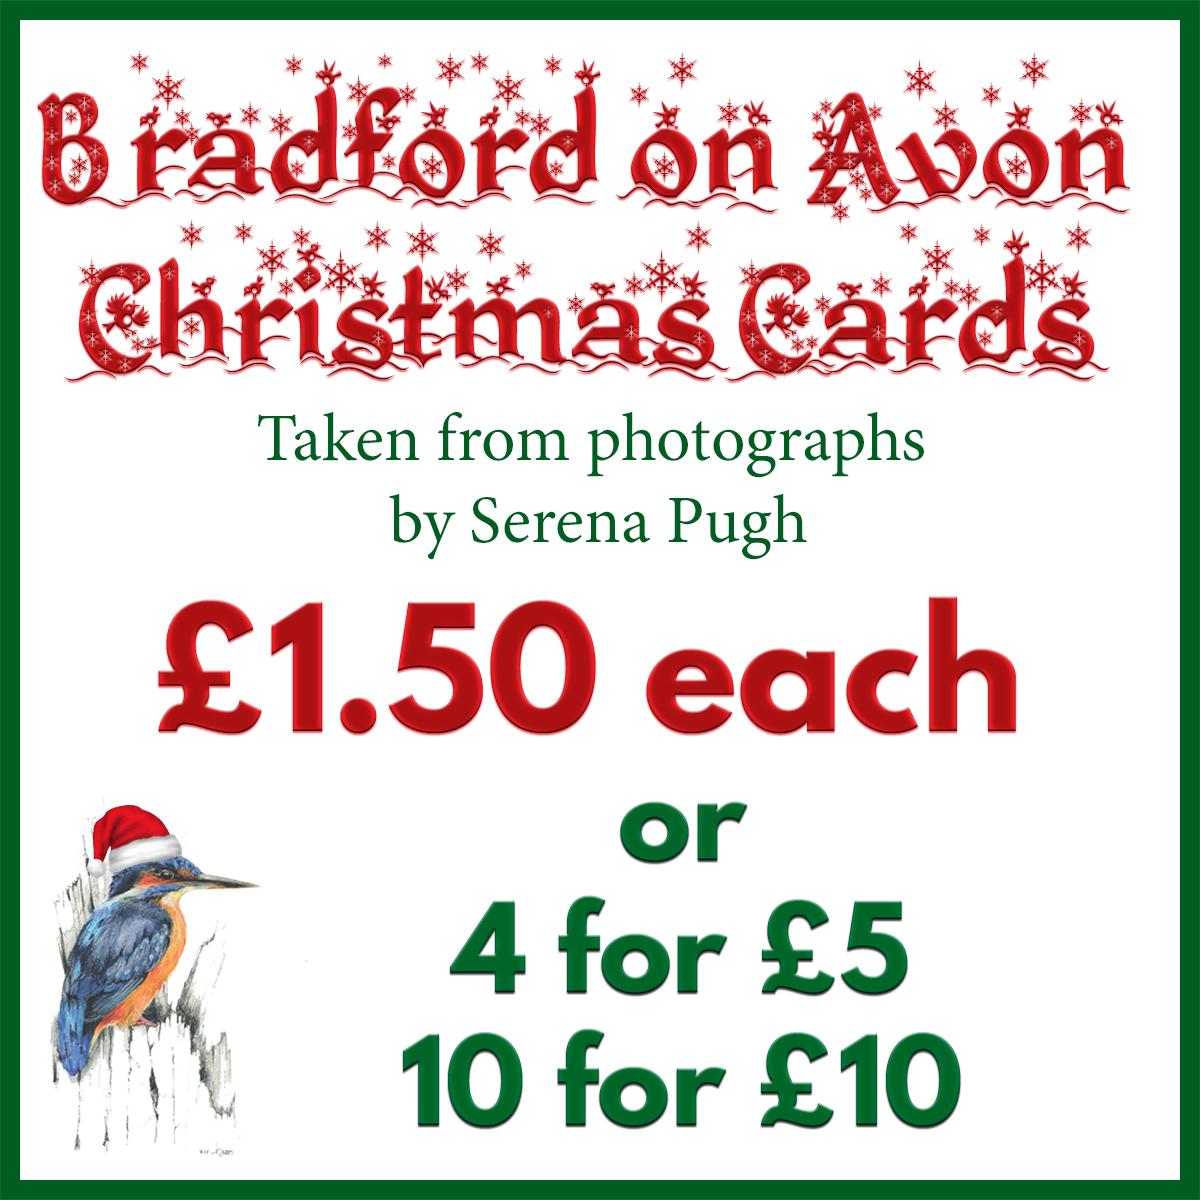 serenarts gallery bradford on avon christmas cards